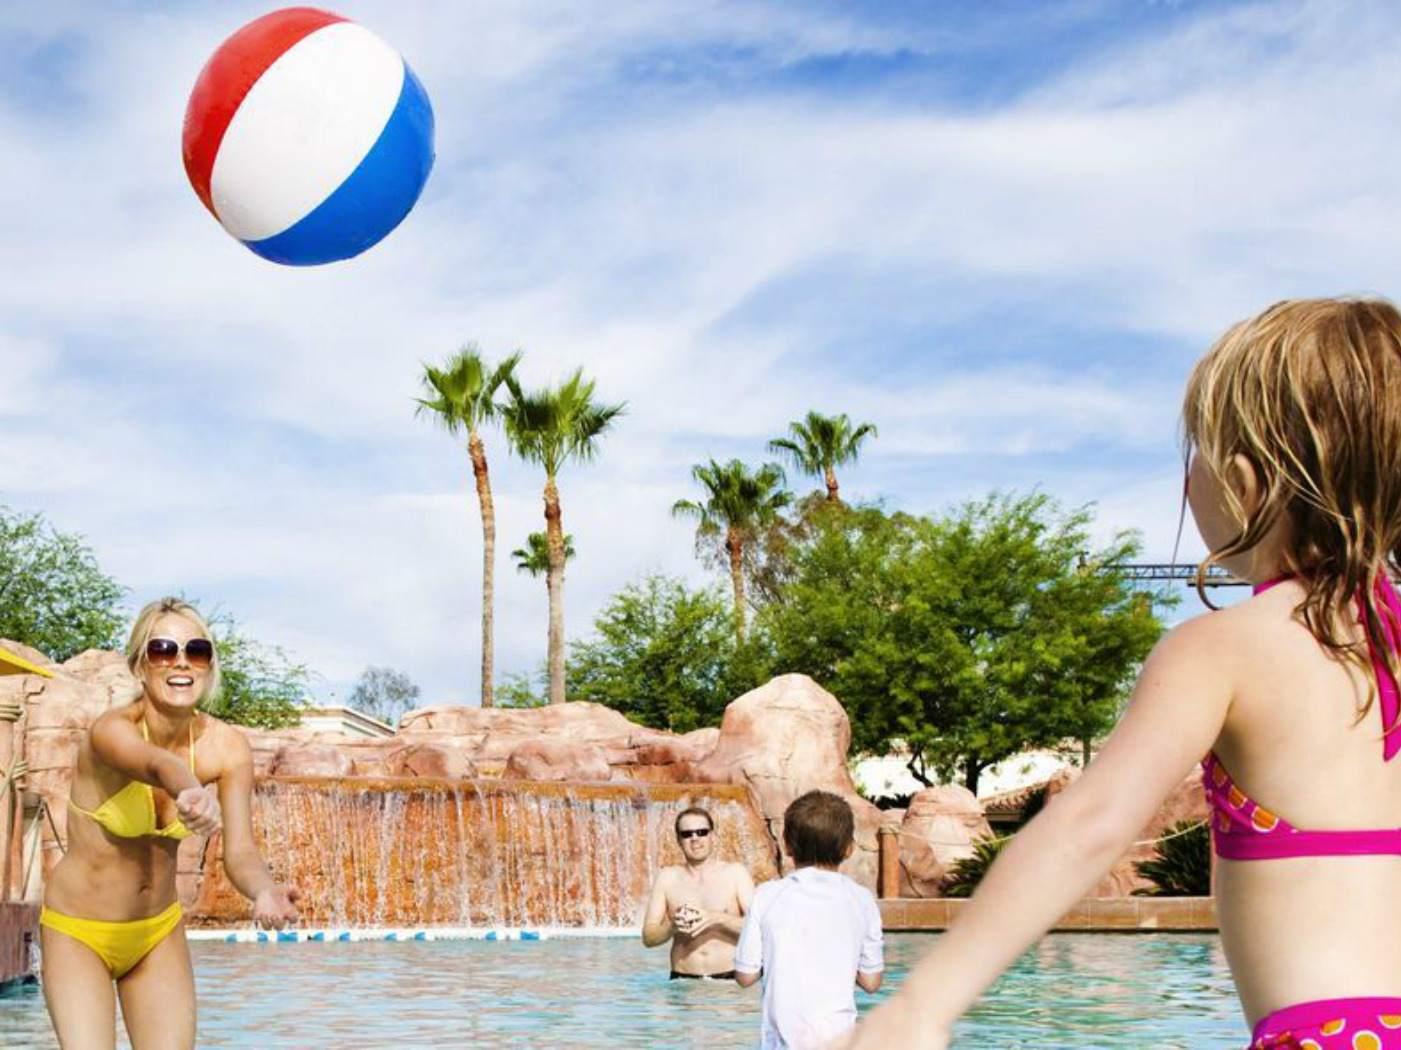 Oasis Park at the Arizona Grand Resort